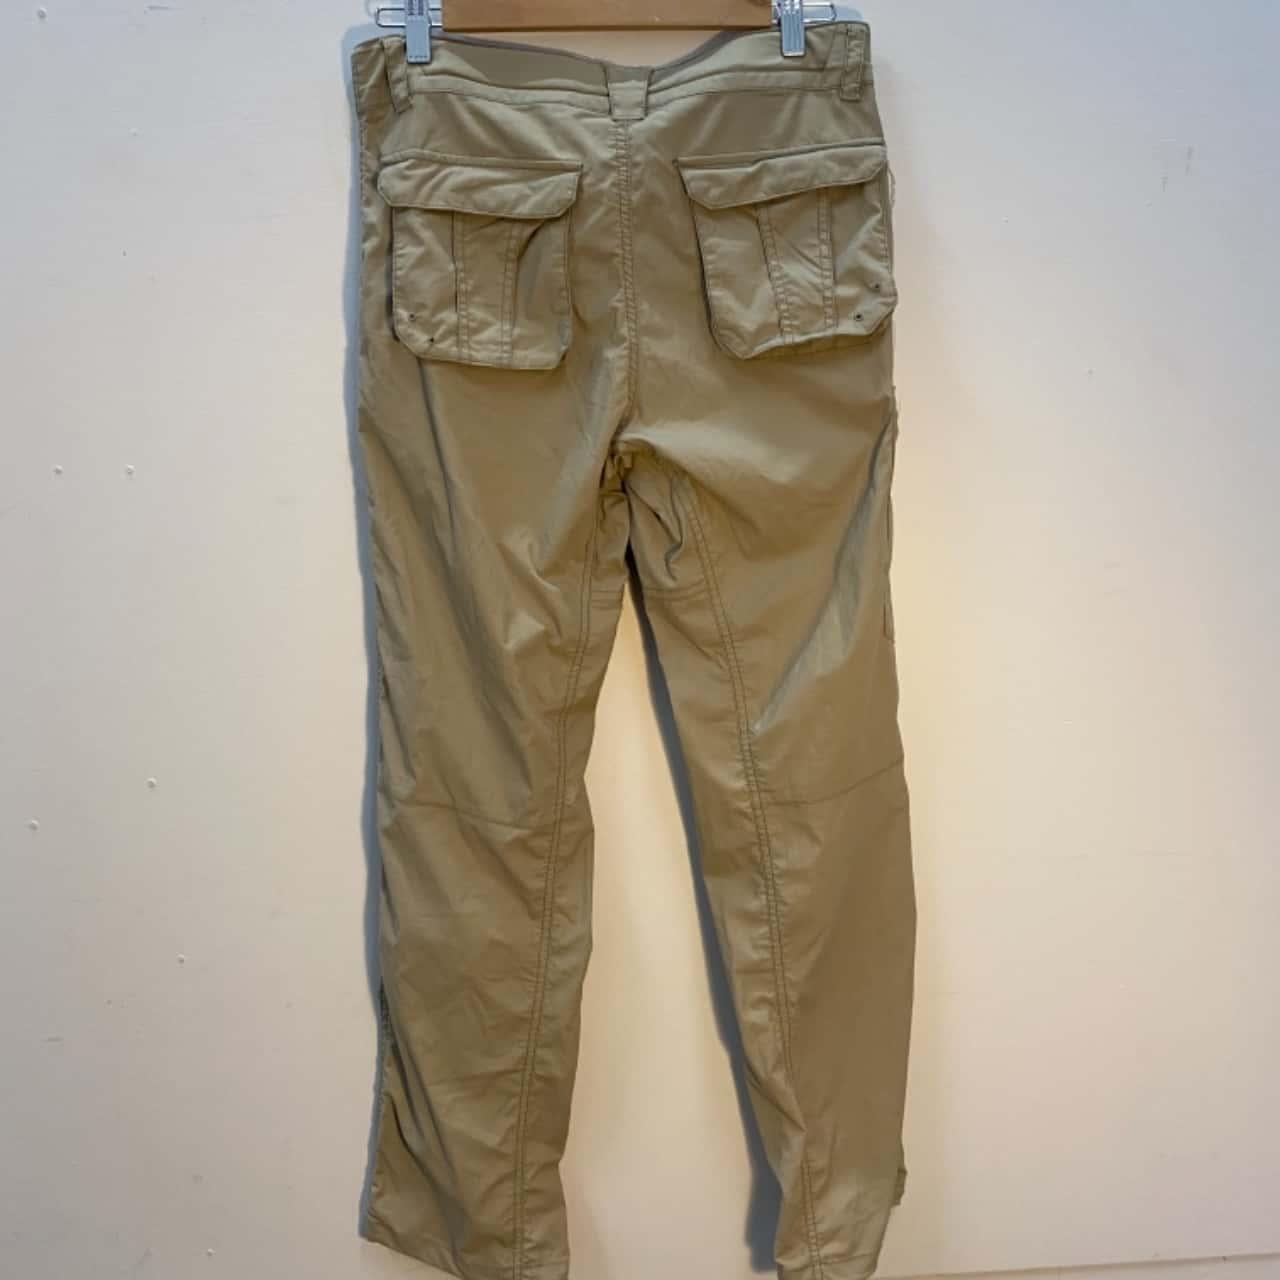 Mens Lightweight Cargo Travel/Hiking Pants Small